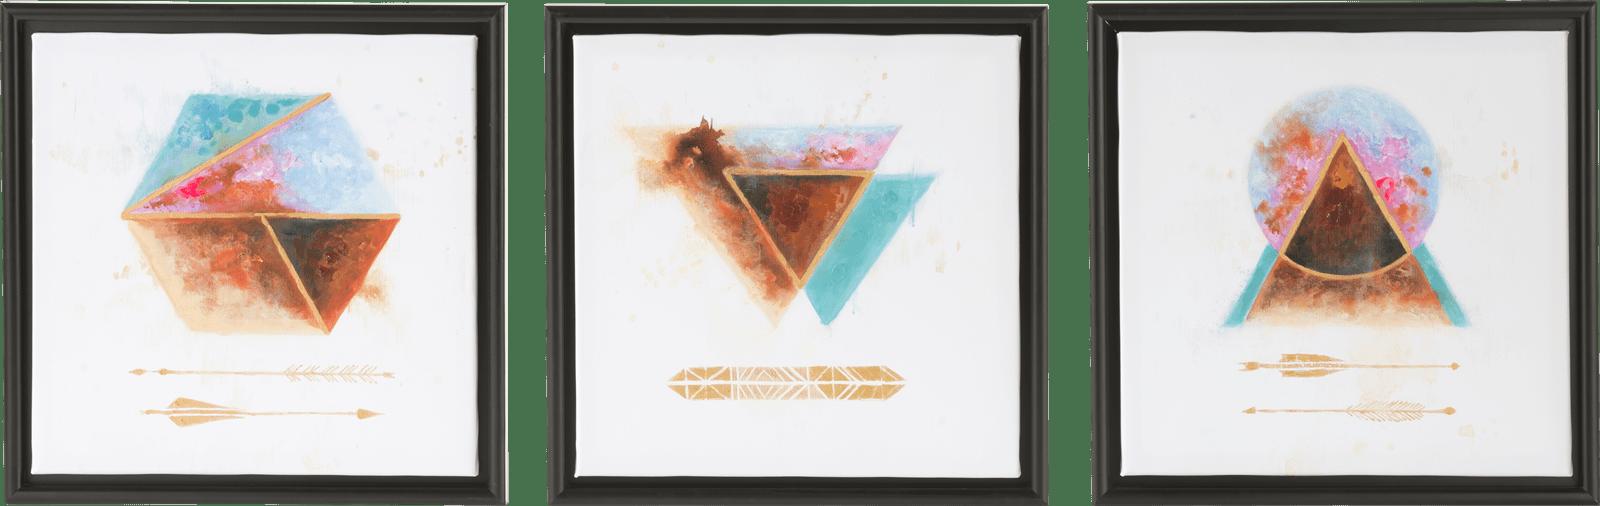 Happy@Home - Coco Maison - a dream set van 3 schilderijen 45x45cm